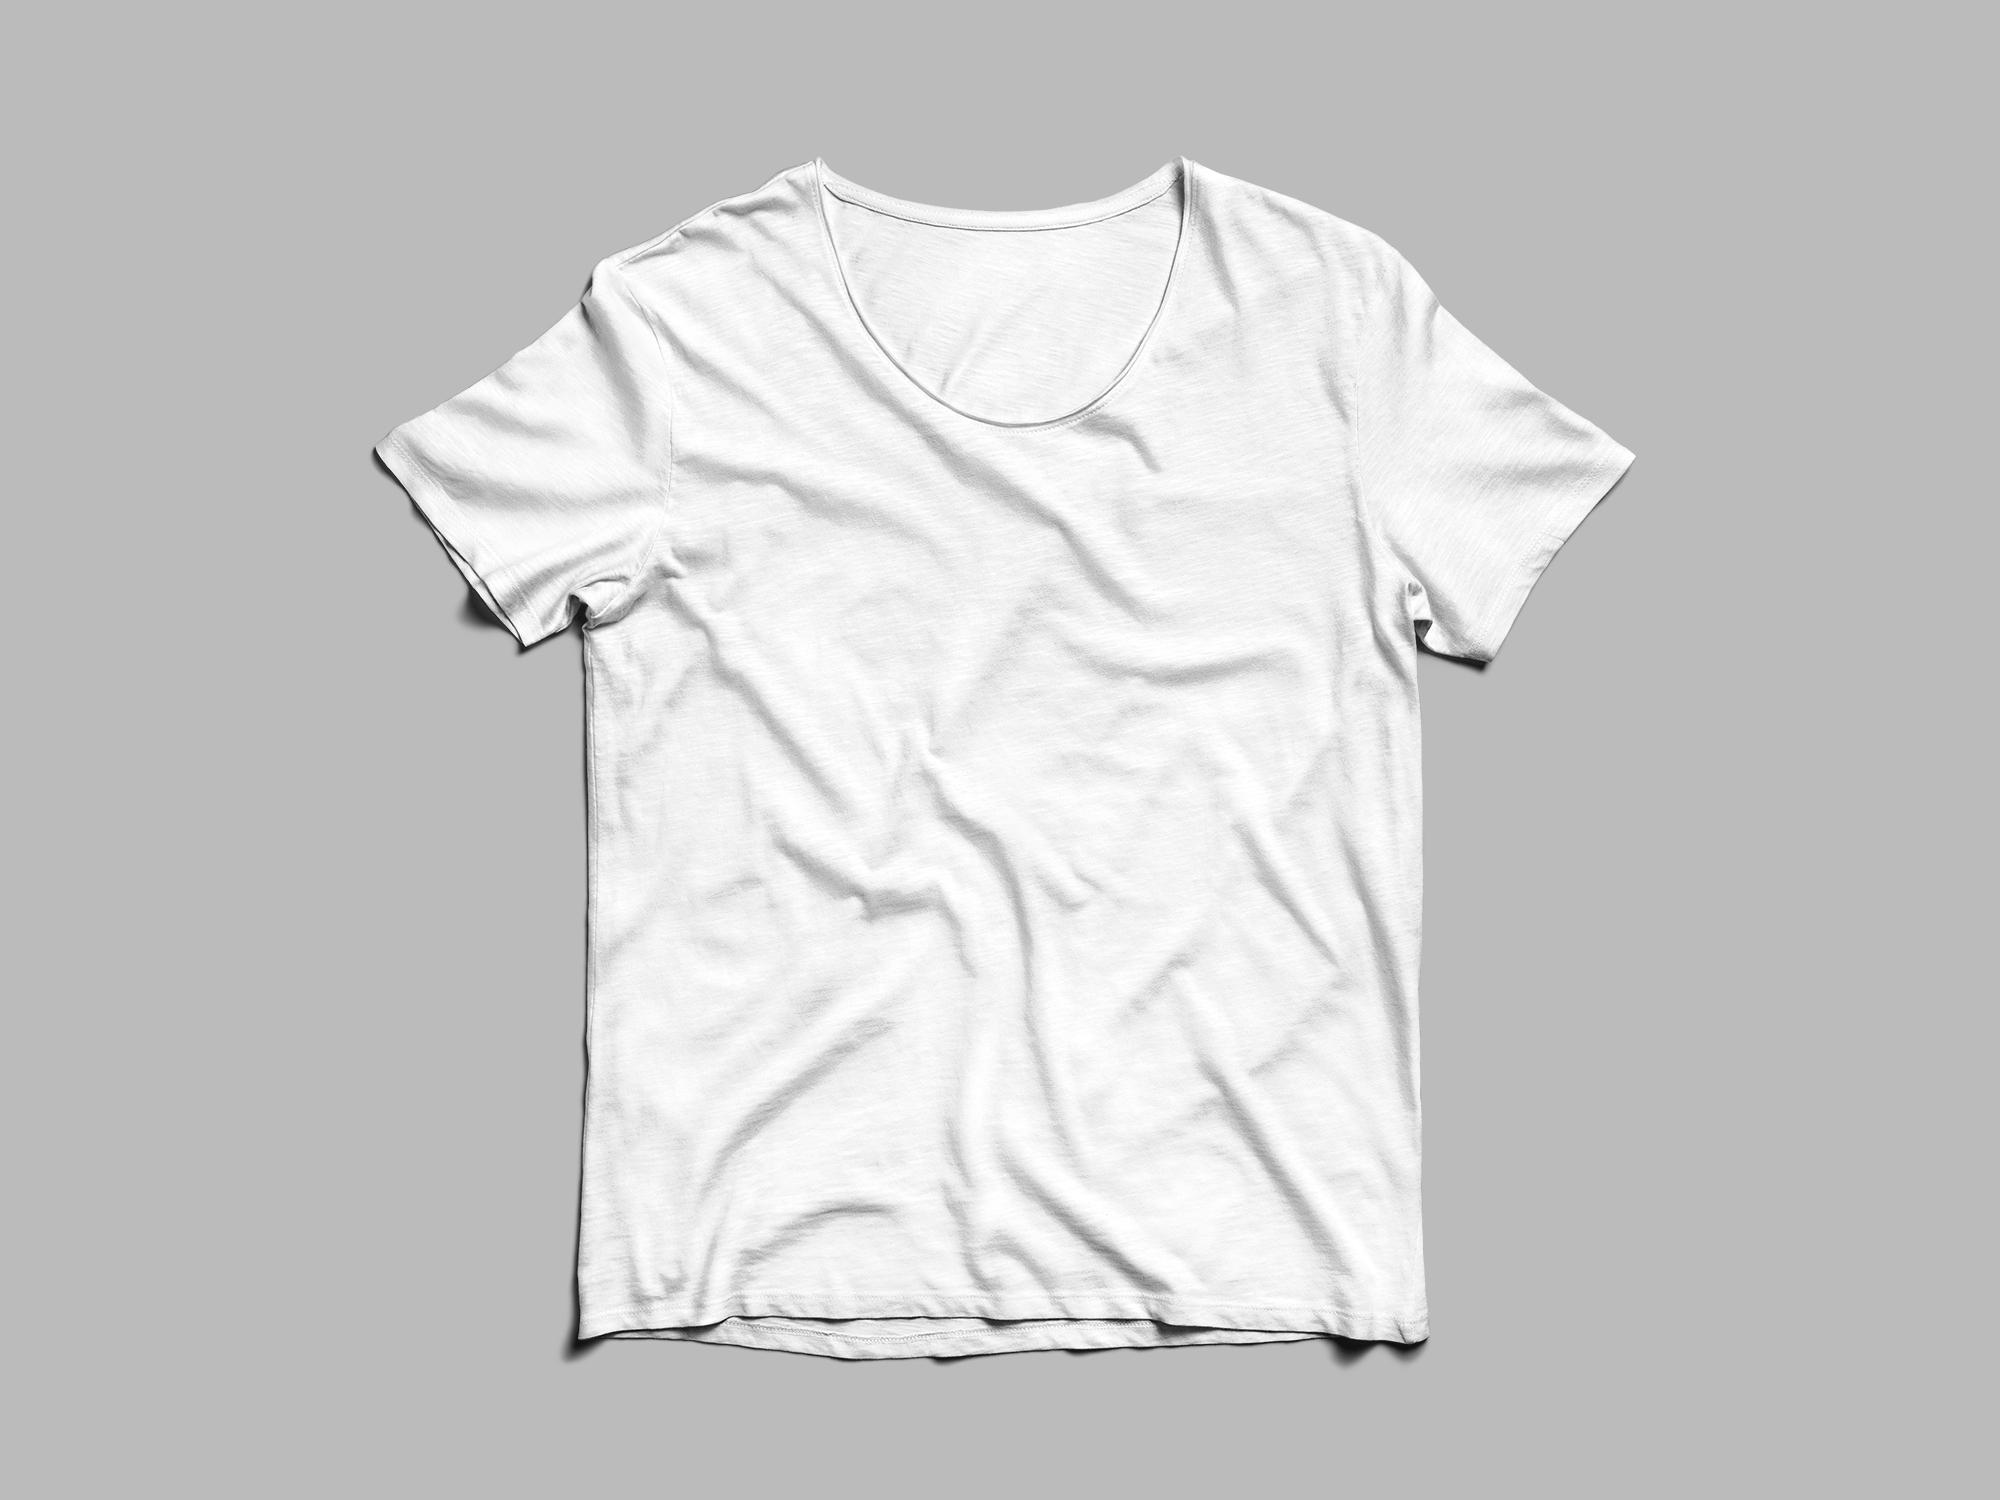 free psd t shirt textile